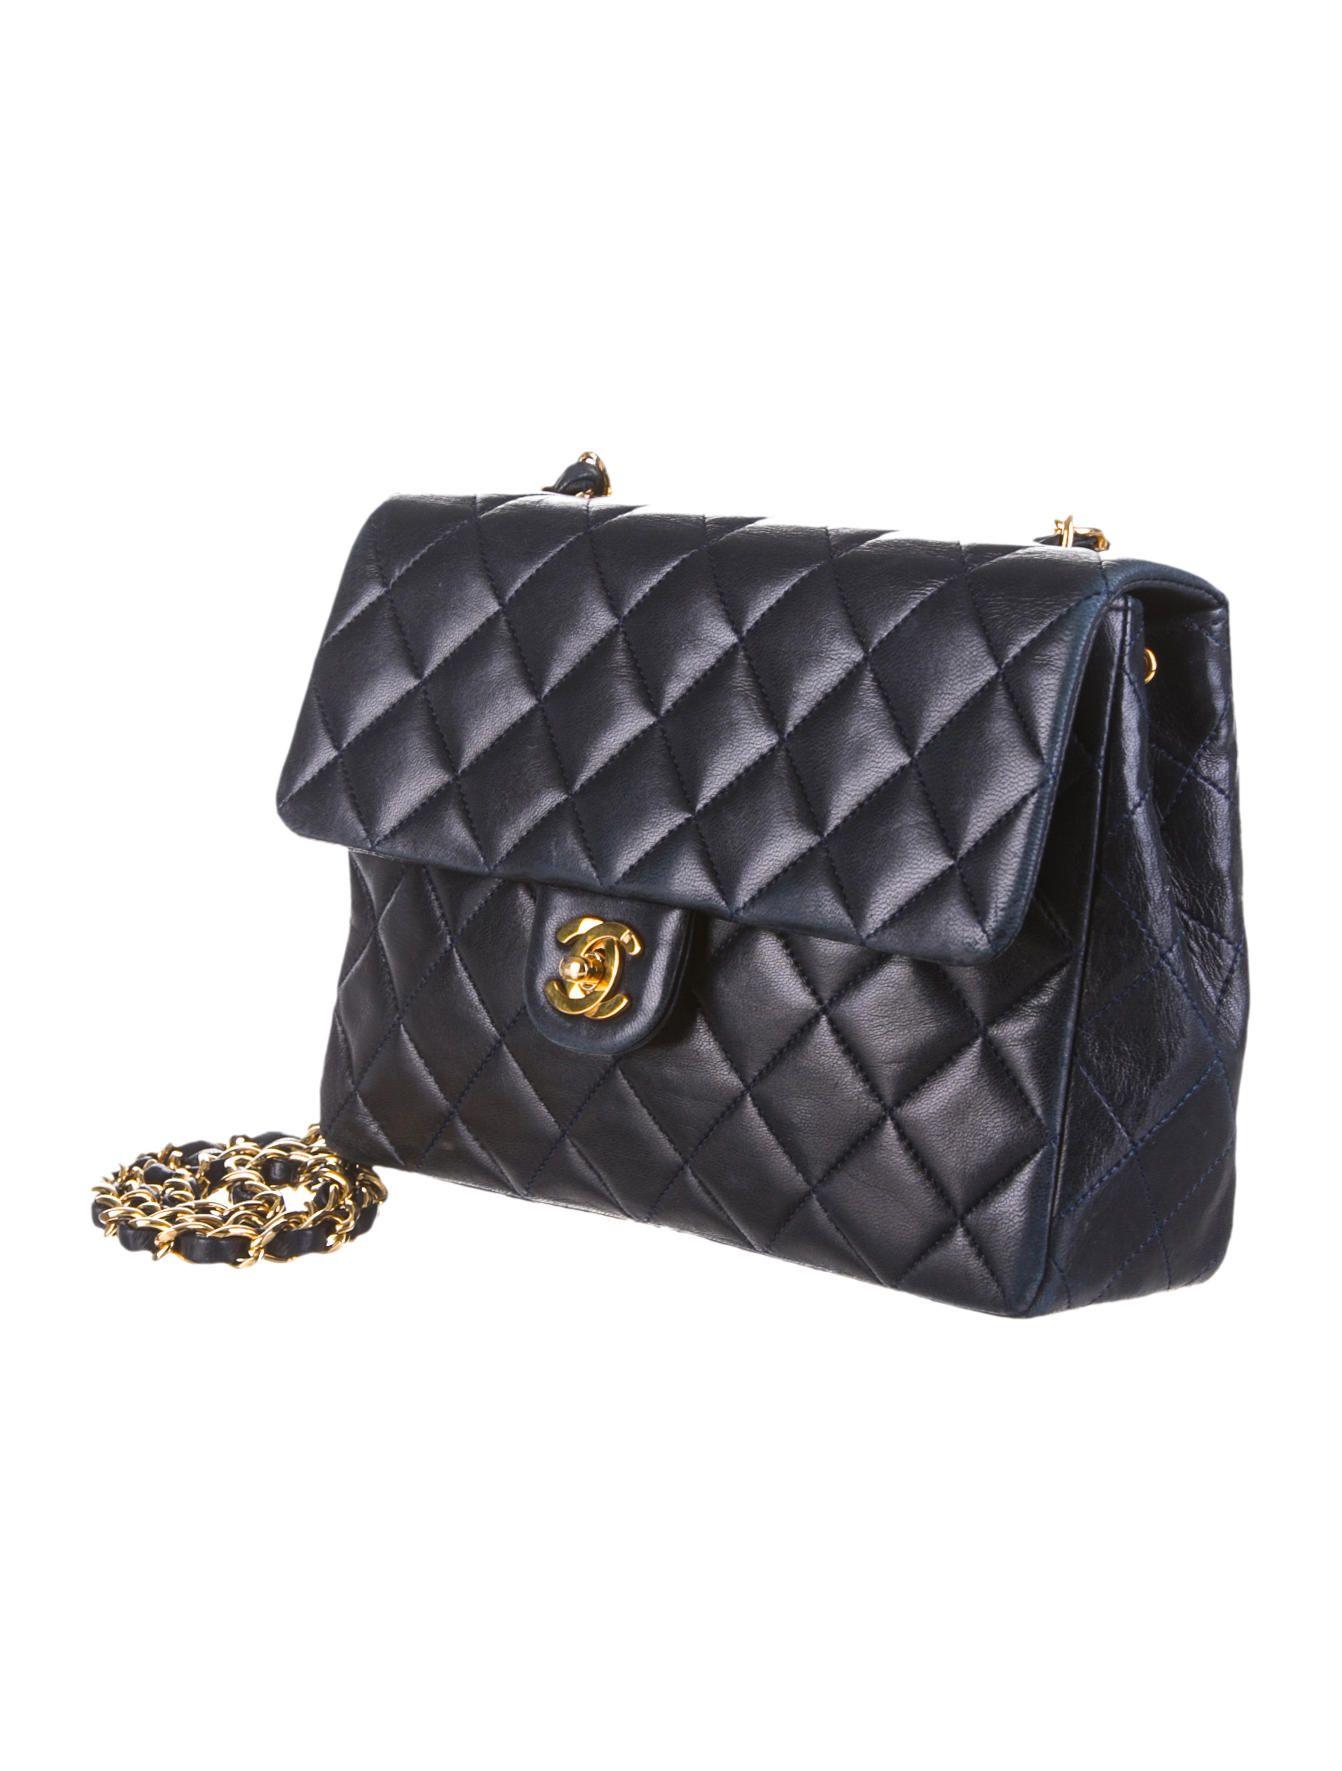 a6dae7dda92c Navy blue quilted leather Chanel vintage Mini Flap bag with brass hardware.  Measurements: Shoulder Strap Drop 20